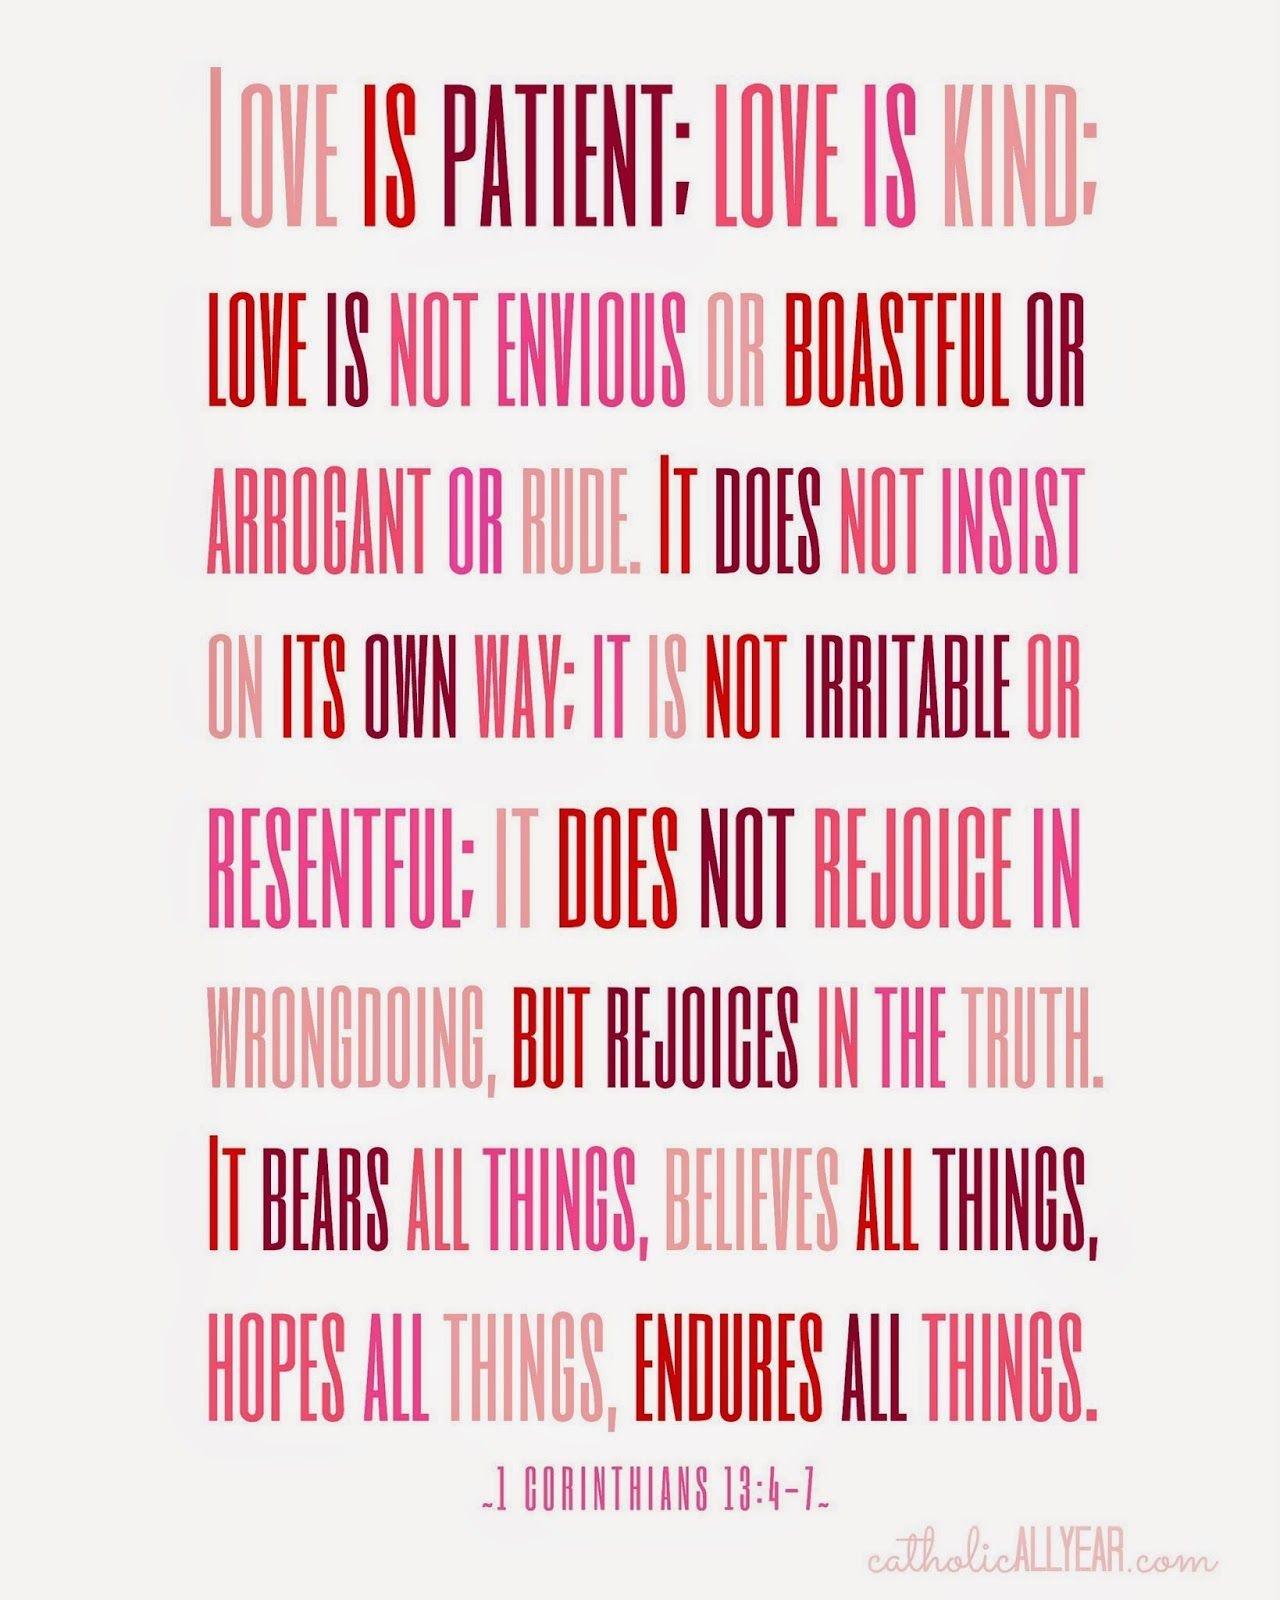 Seven Free Printable Catholic Valentines | Holidays | Catholic All - Love Is Patient Free Printable